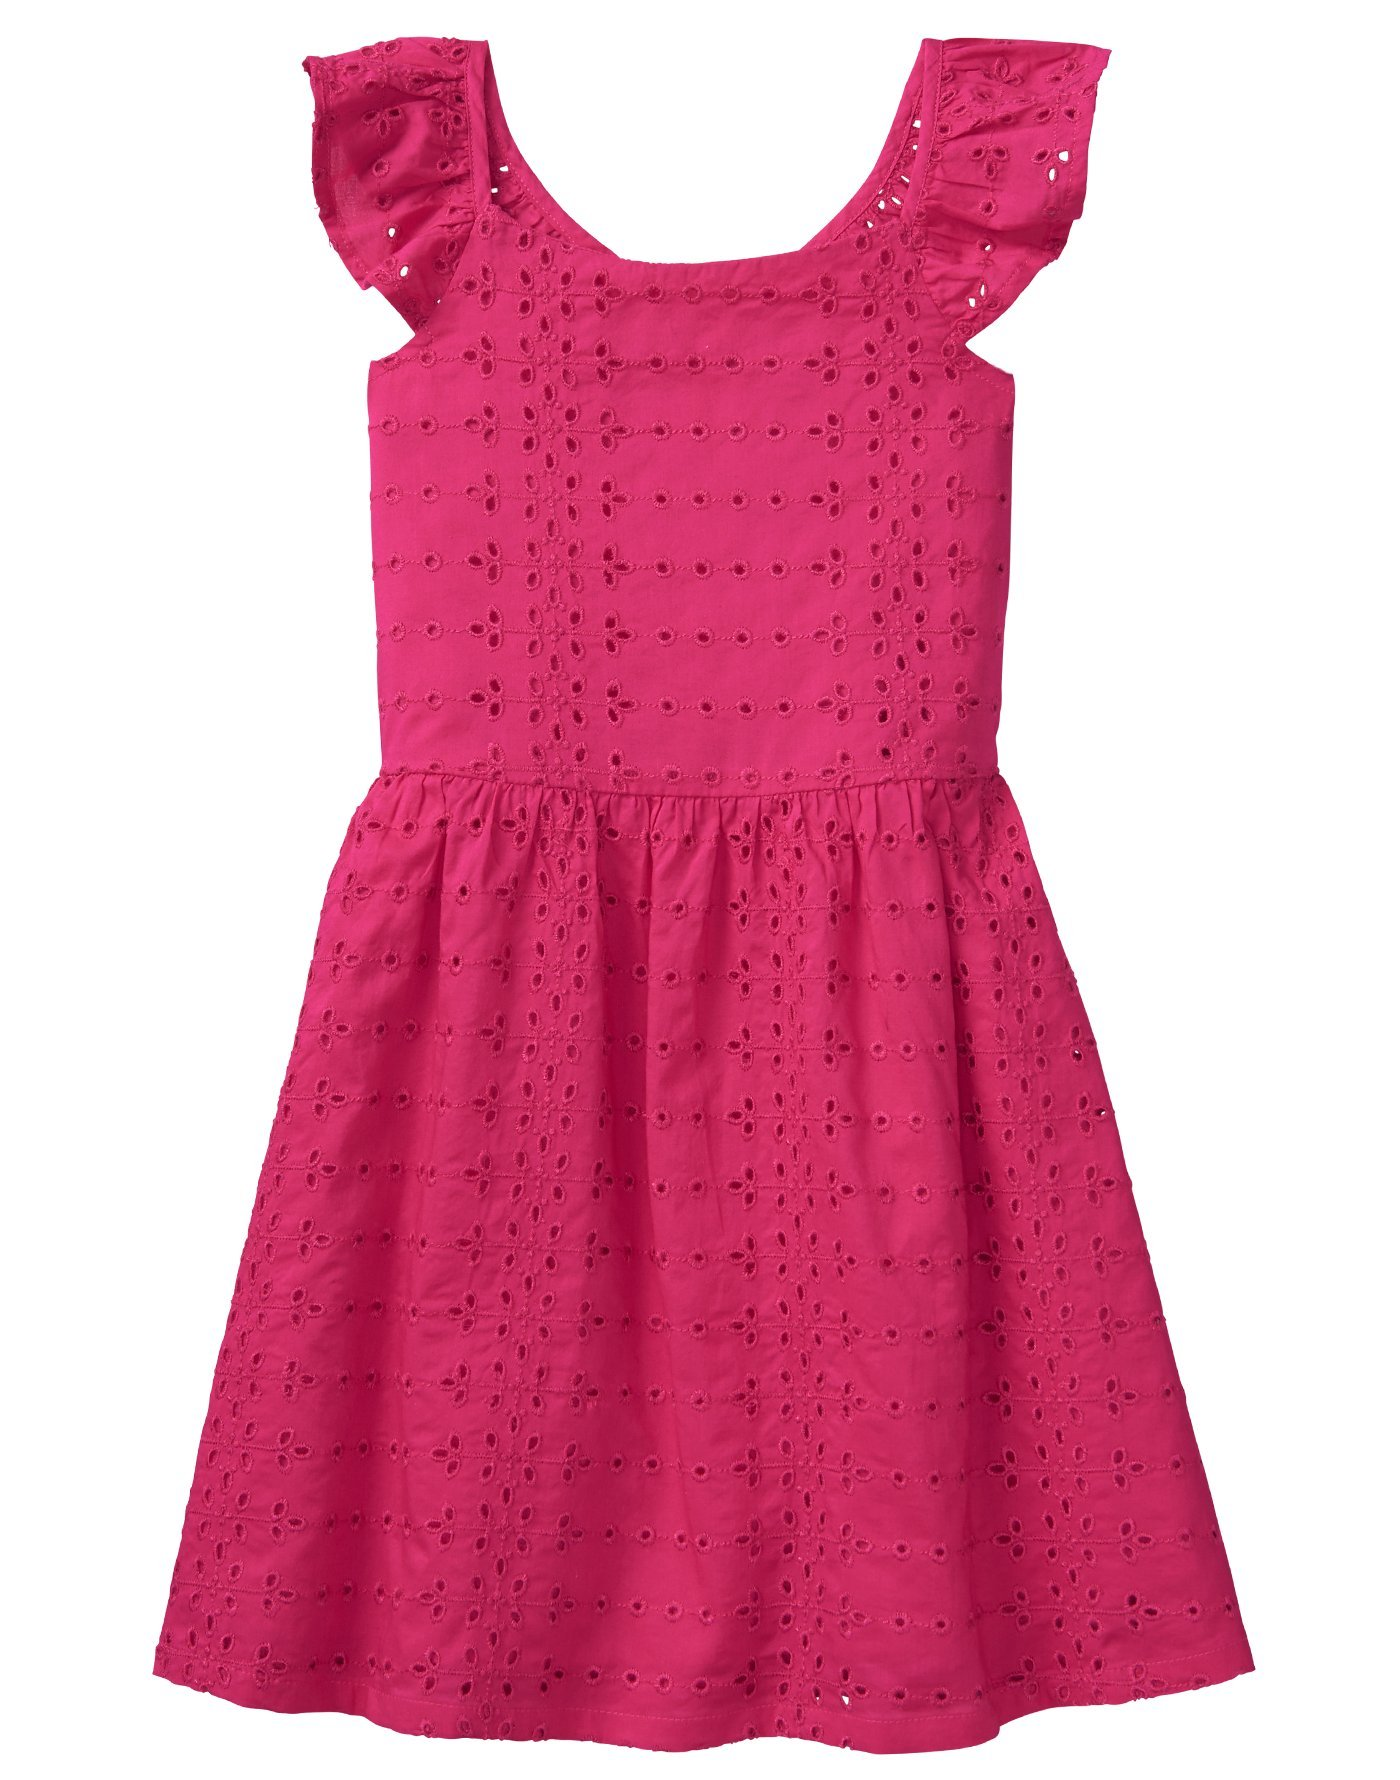 Crazy 8 Little Girls' Eyelet Dress, Bright Rose, 6